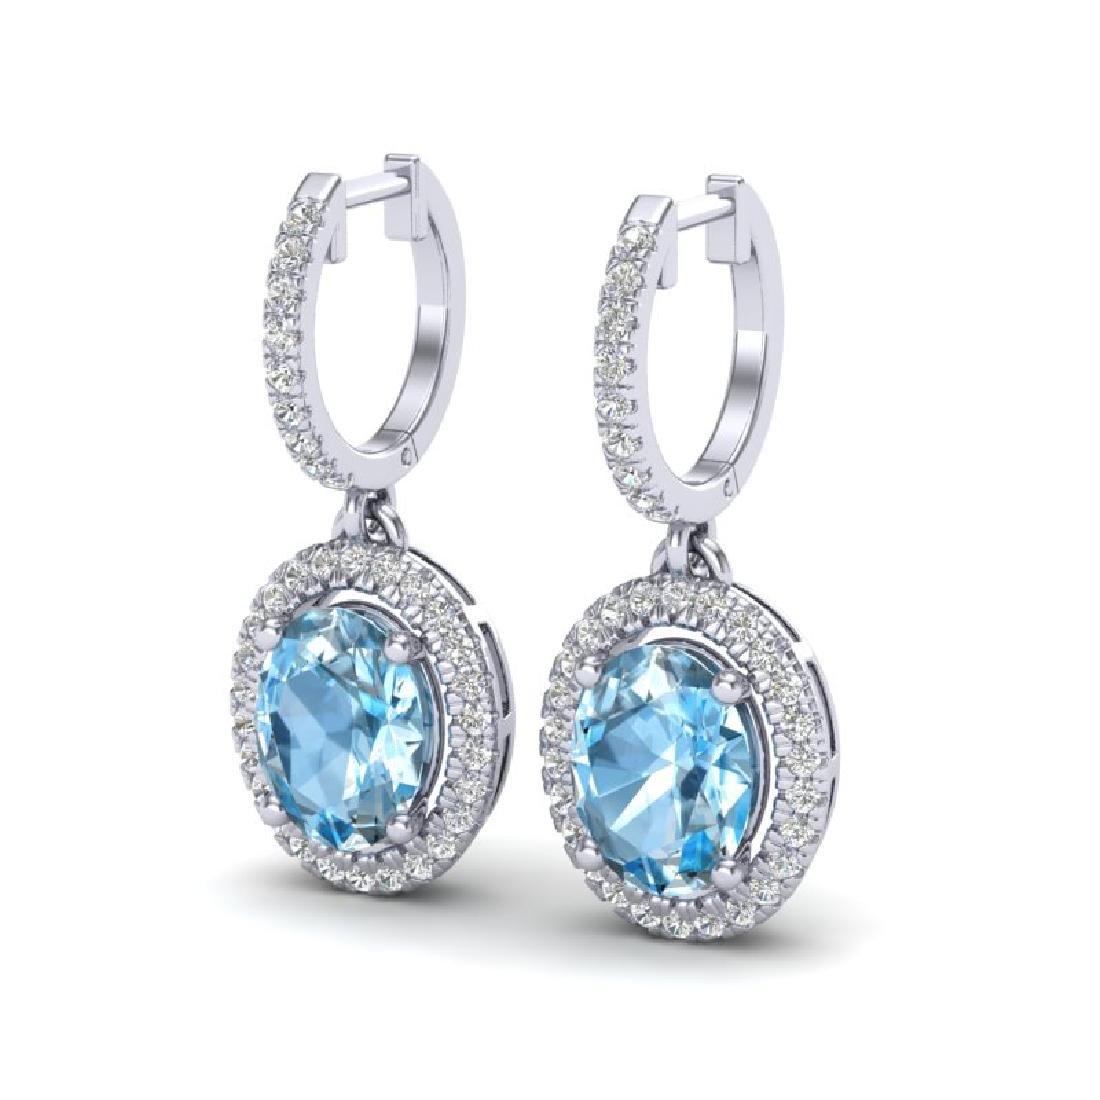 4.25 CTW Sky Blue Topaz & Micro VS/SI Diamond Earrings